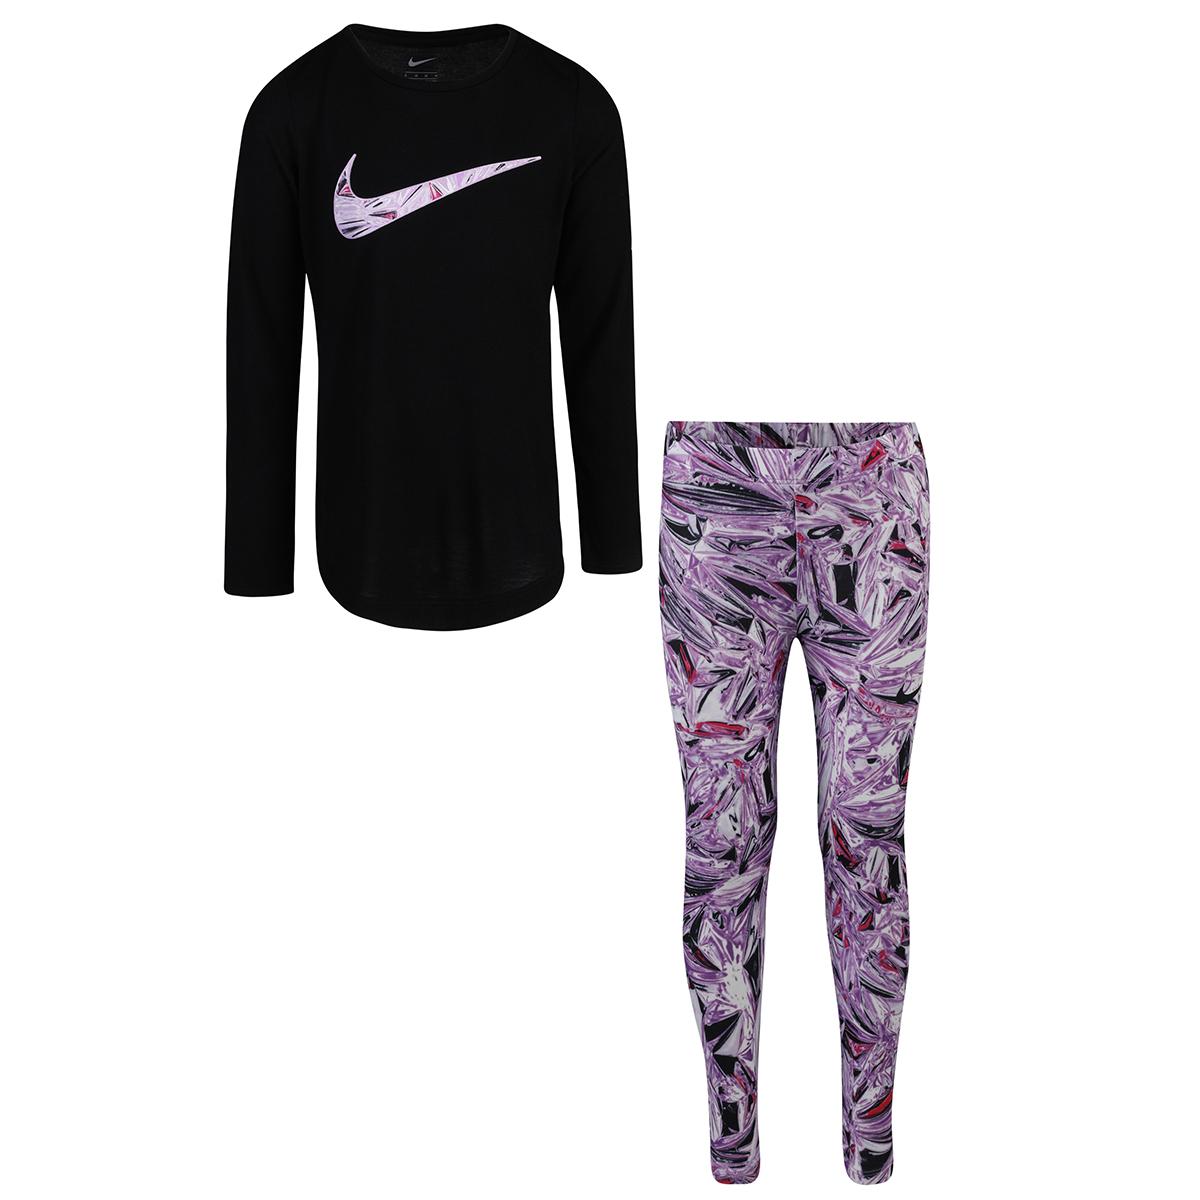 Nike Toddler Girls' Long Sleeve Tunic And Mylar Swirl Legging Set - Purple, 2T